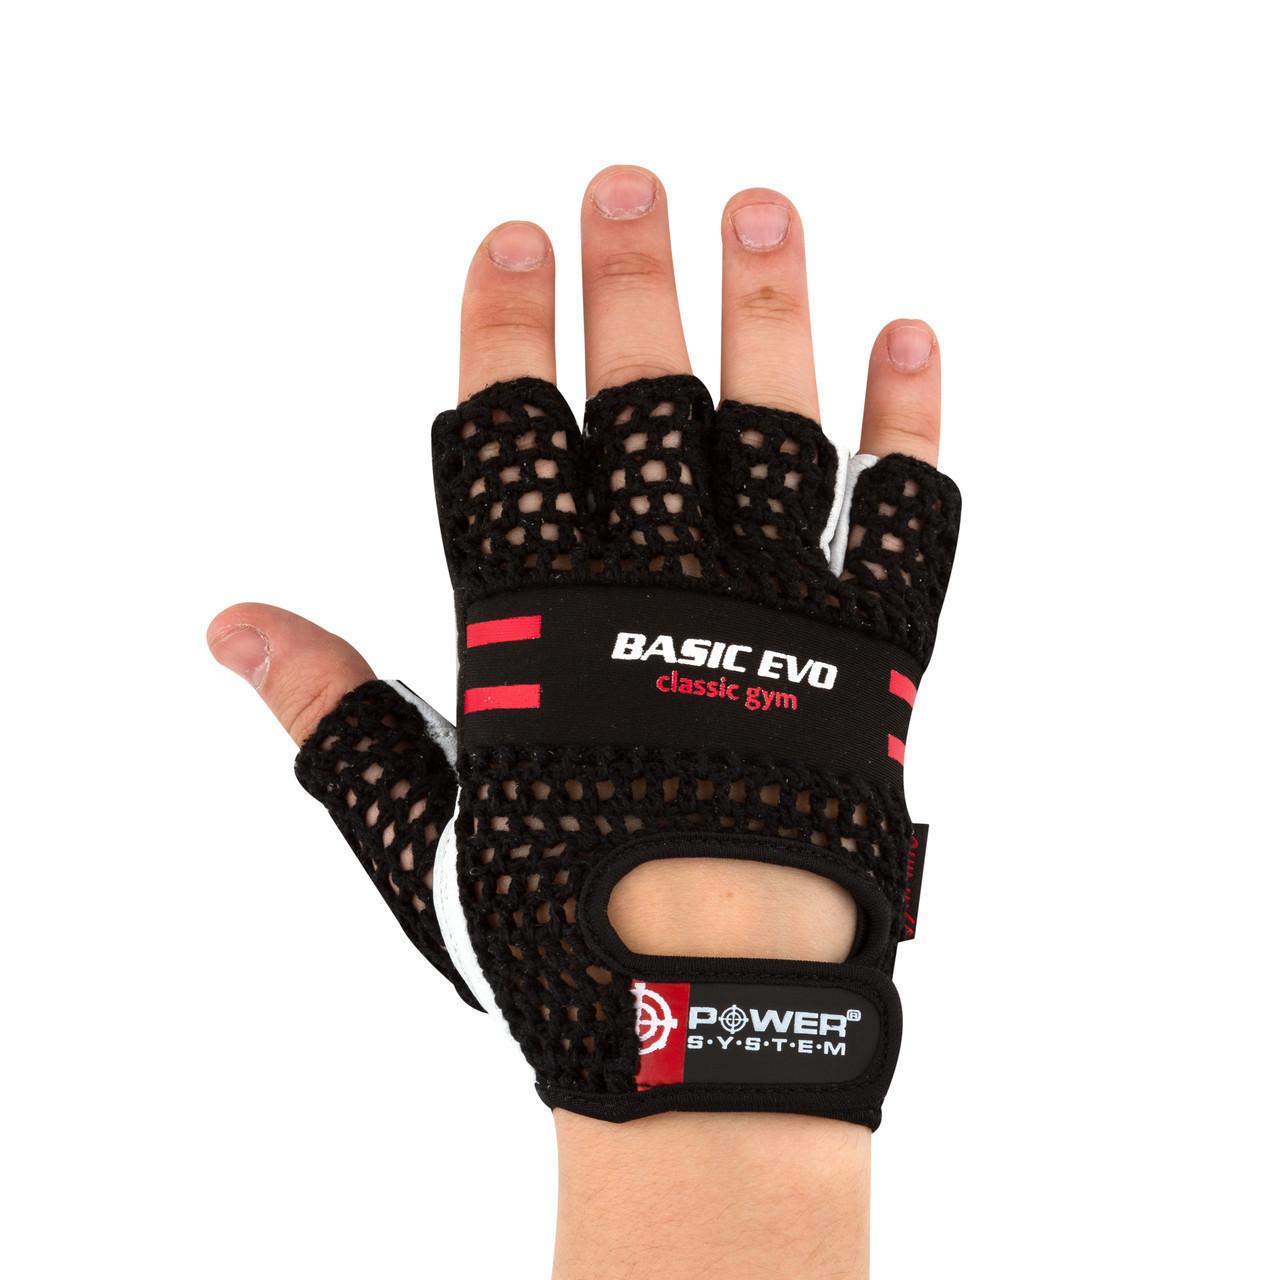 Перчатки для фитнеса и тяжелой атлетики Power System Basic EVO PS-2100 XL Black/Red Line